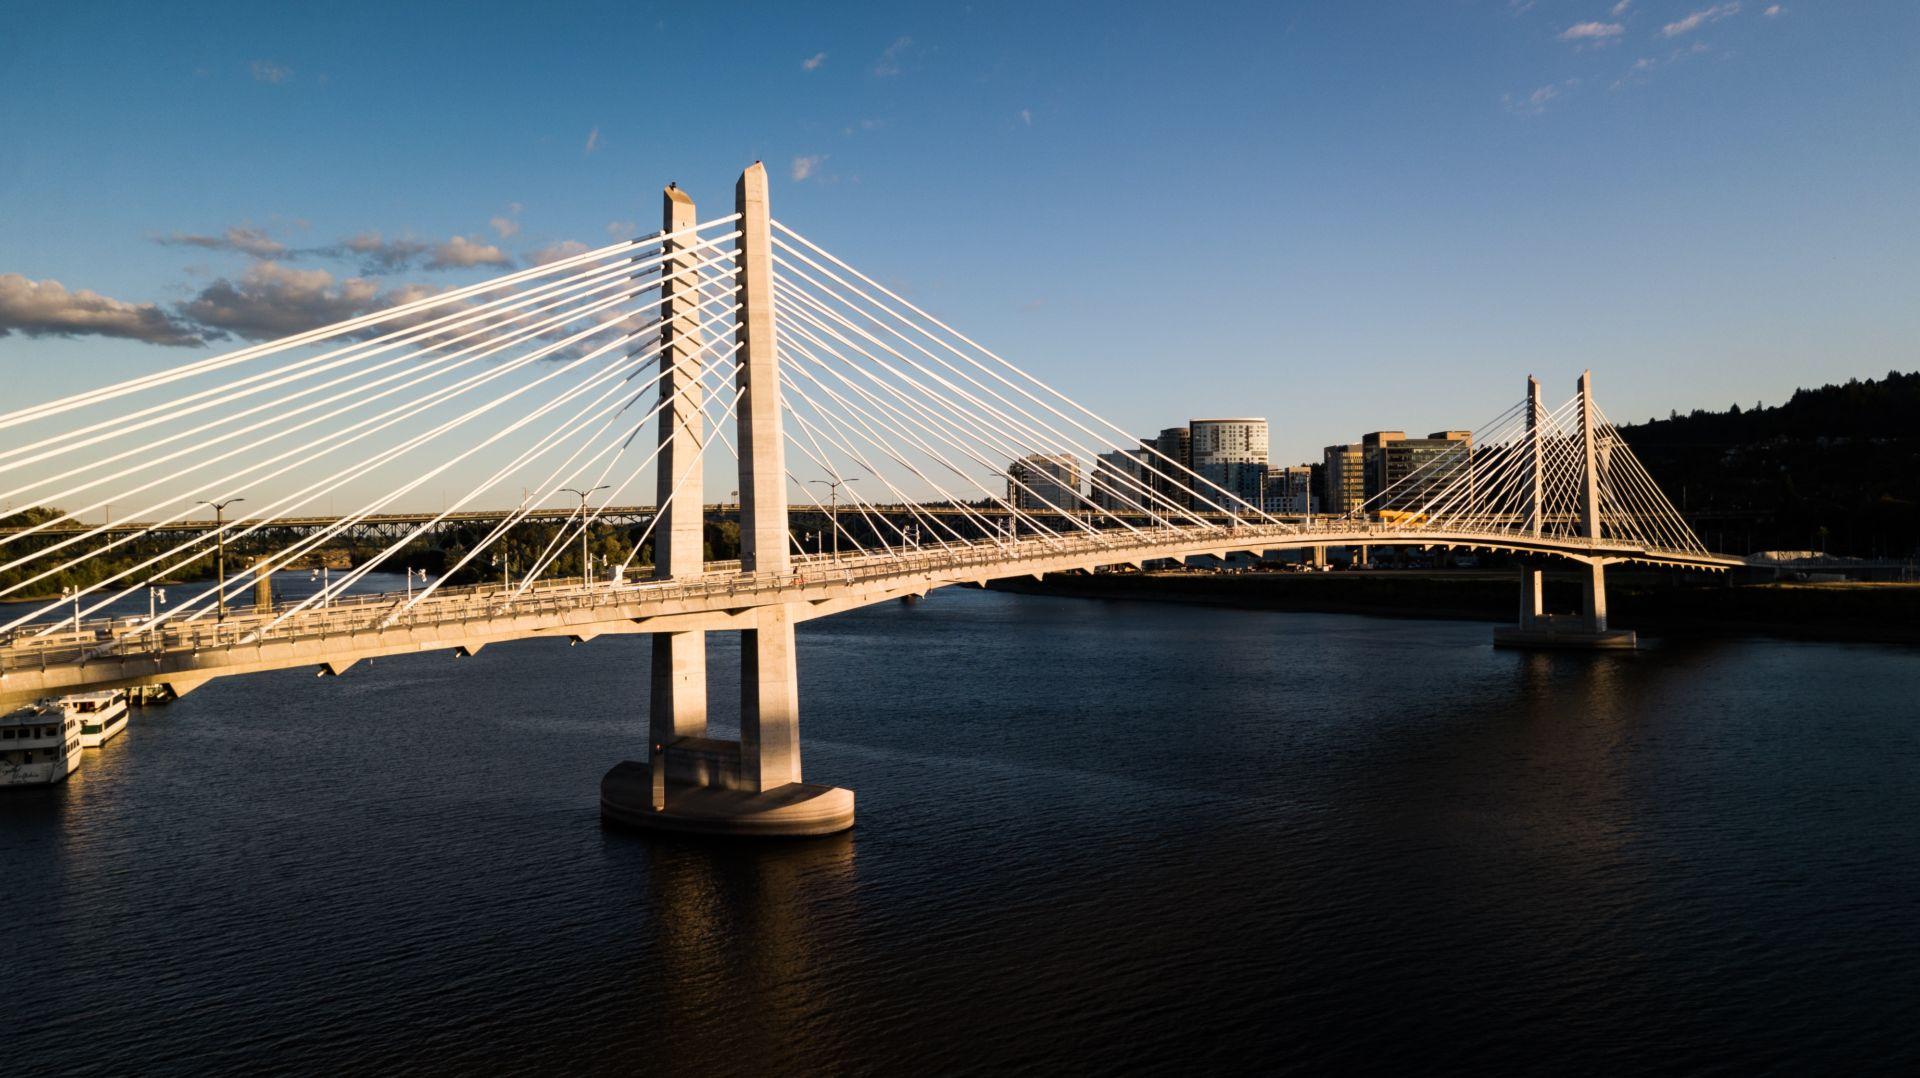 Portland's Tilikum Crossing